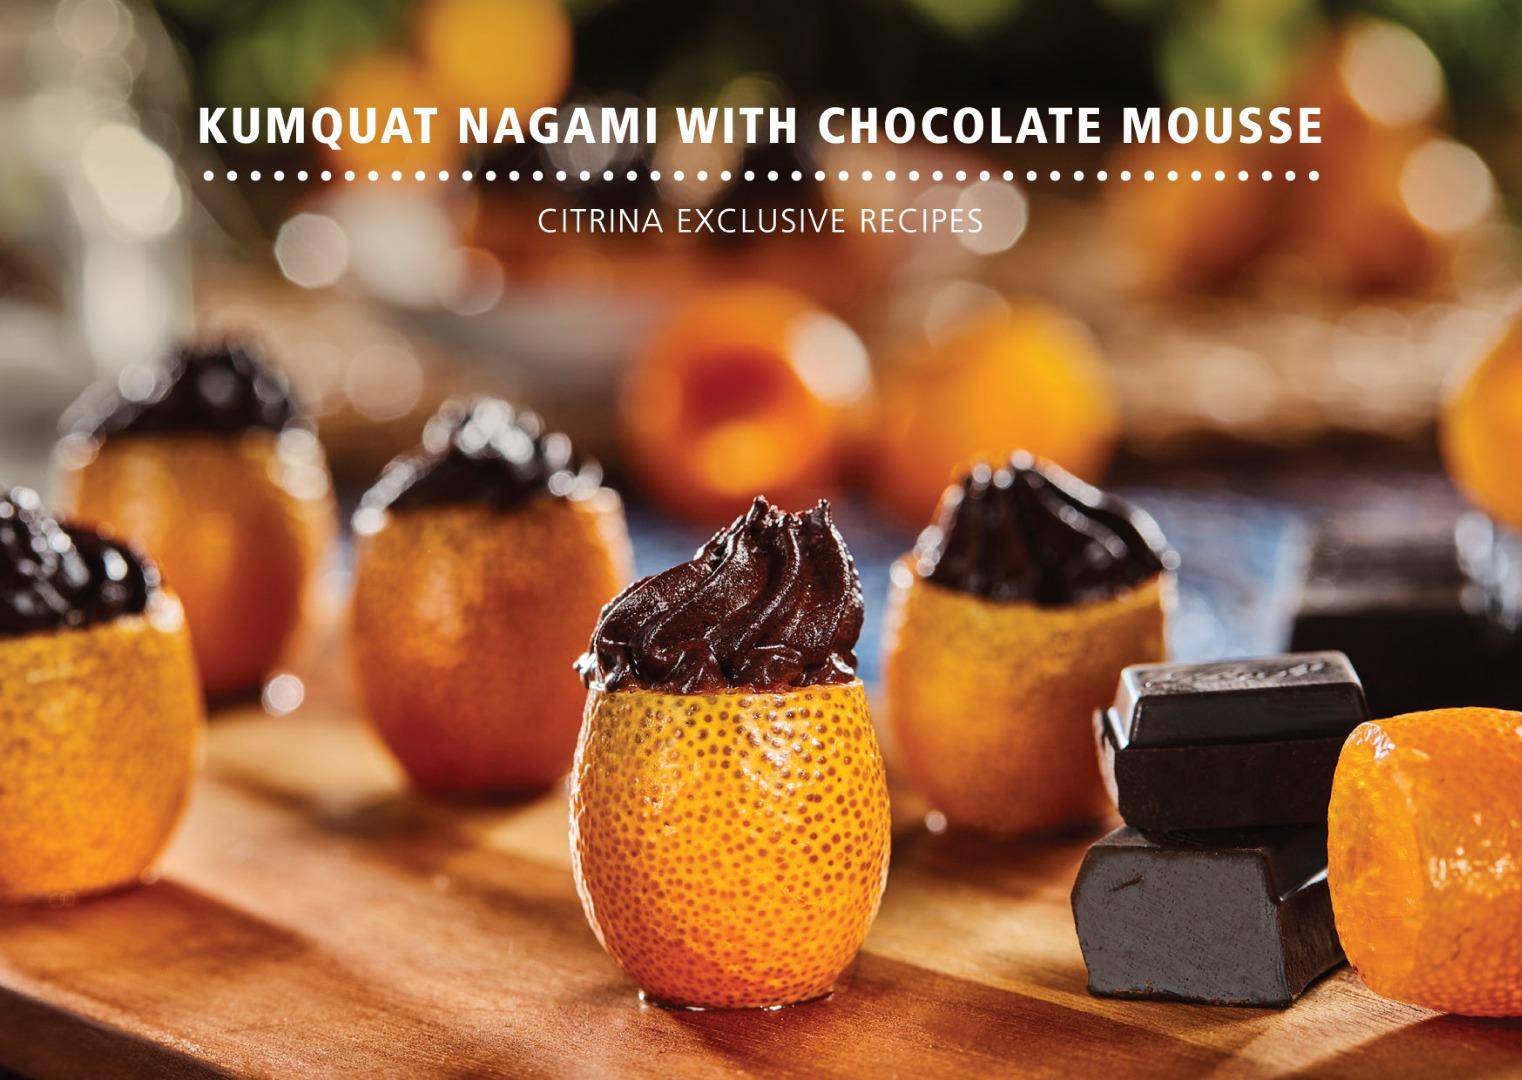 Kumquat - Ophelia Kumquat Nagami com mousse de chocolate